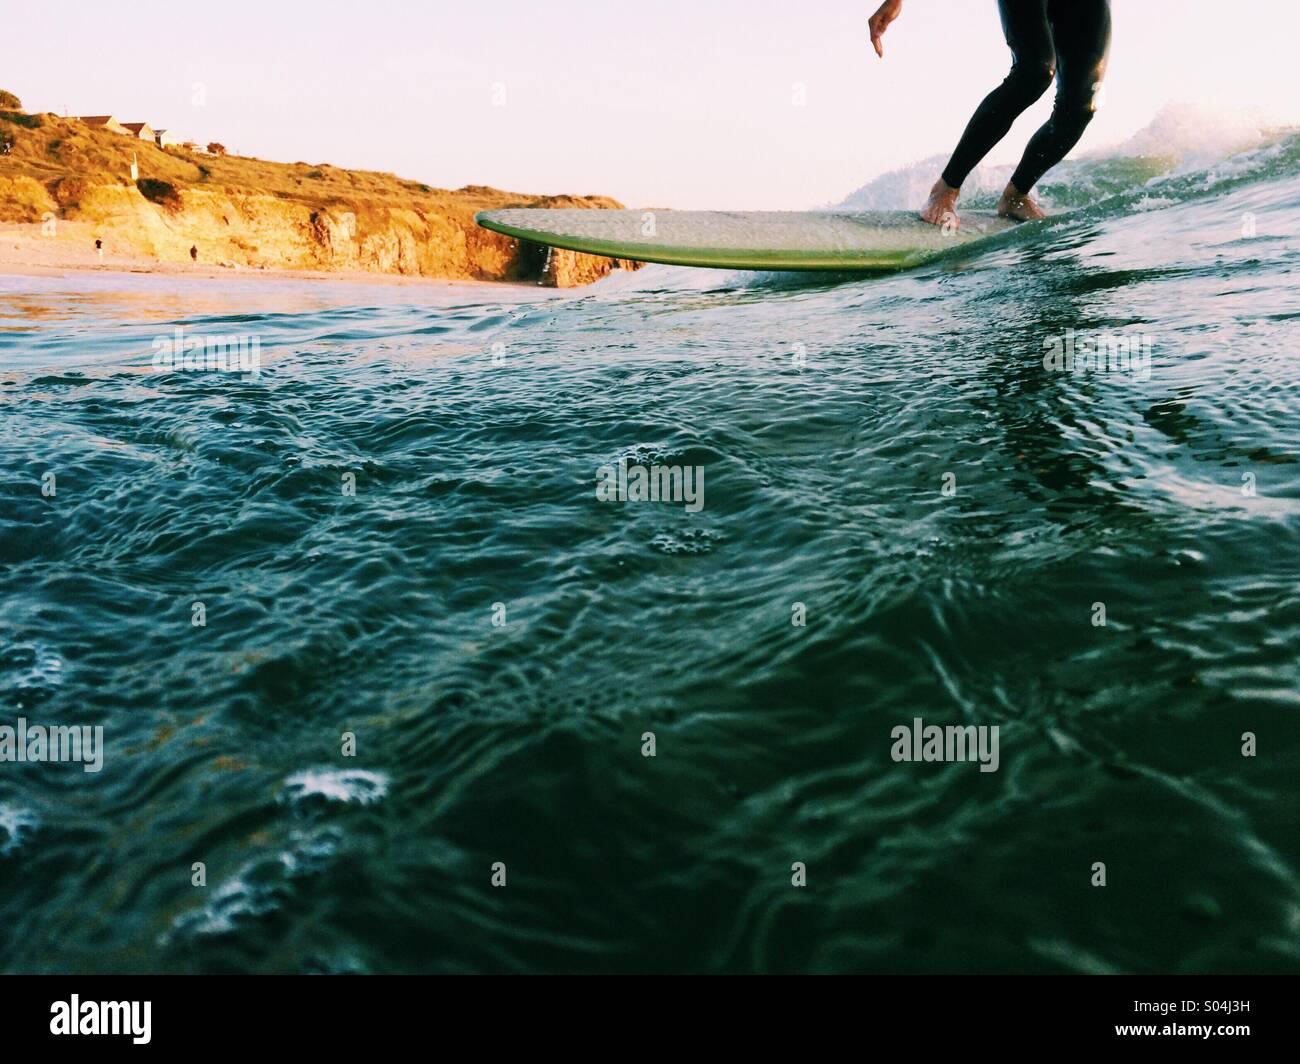 Surfer auf einem Longboard bei Sonnenuntergang im Sommer Stockbild